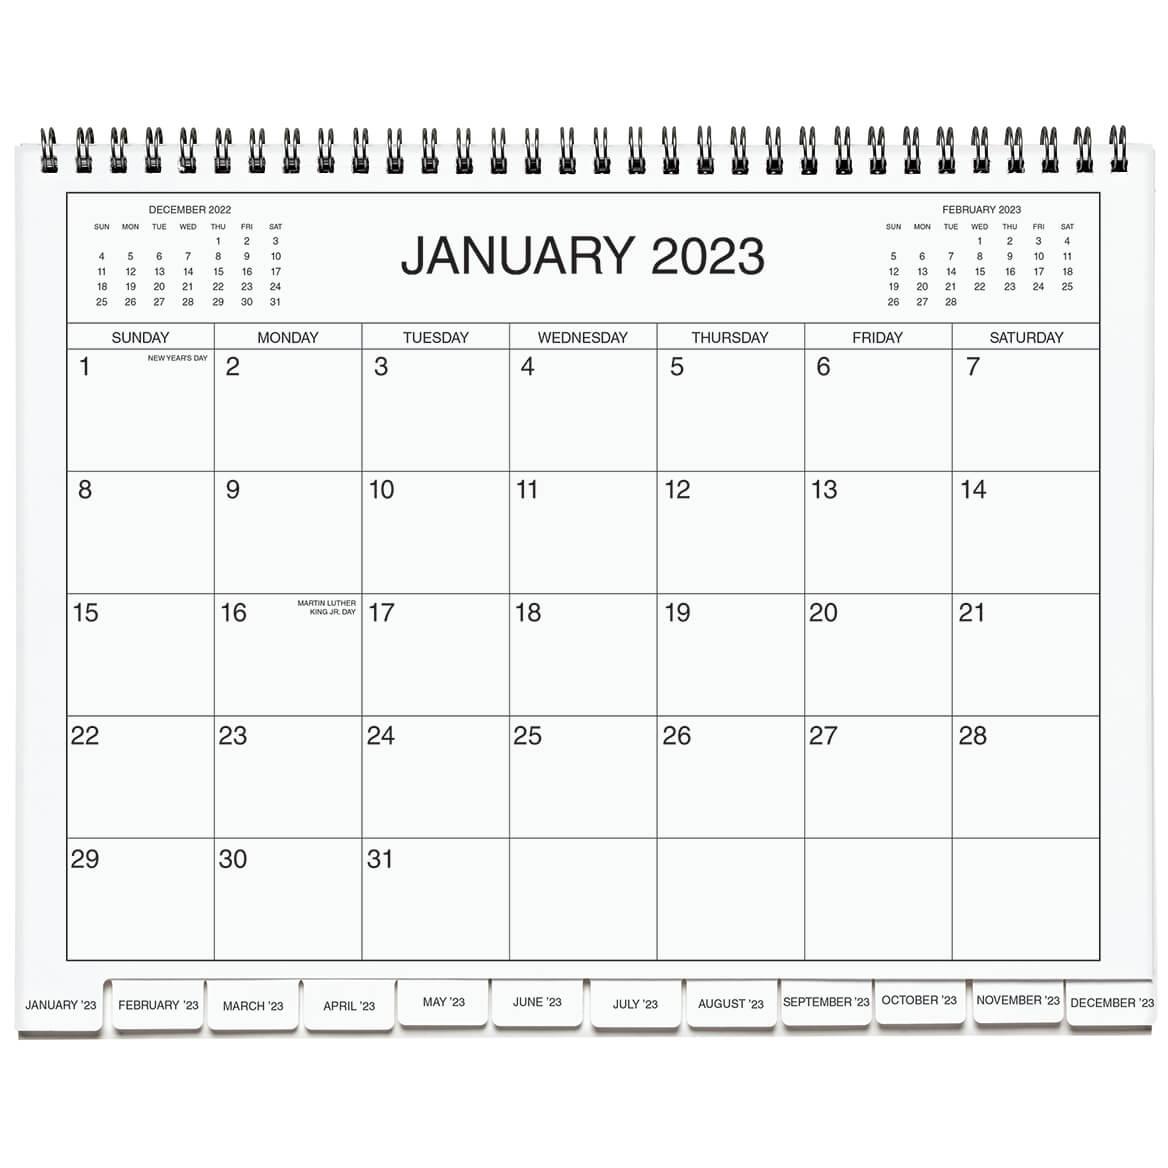 Three Year Calendar/Planner 2021-2023 - Miles Kimball